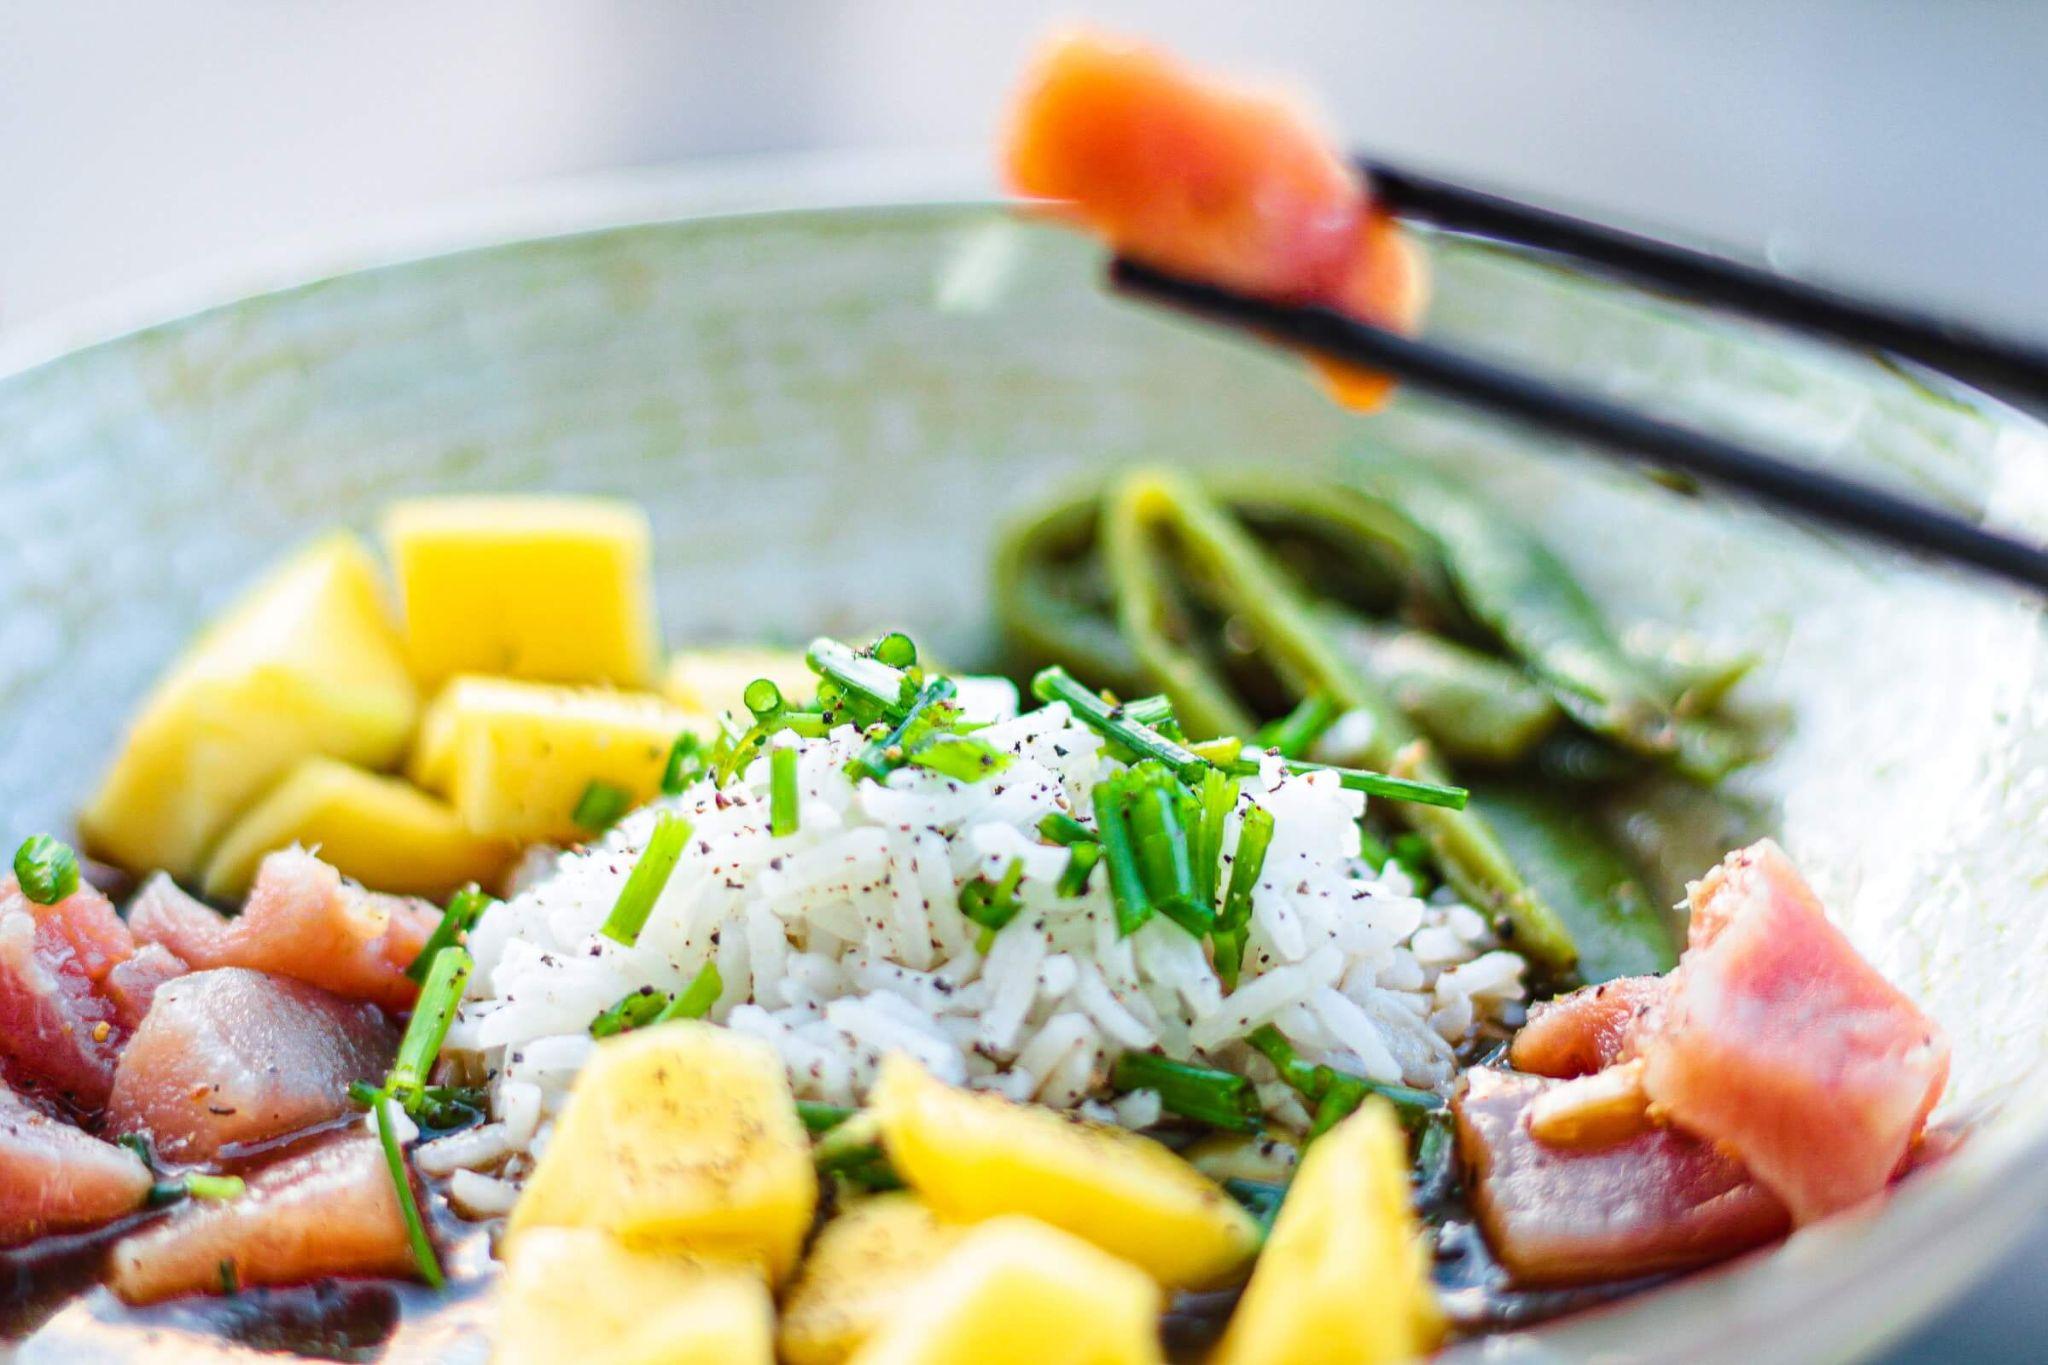 Hawaiian Poke, tuna, soy sauce, green onions, rice